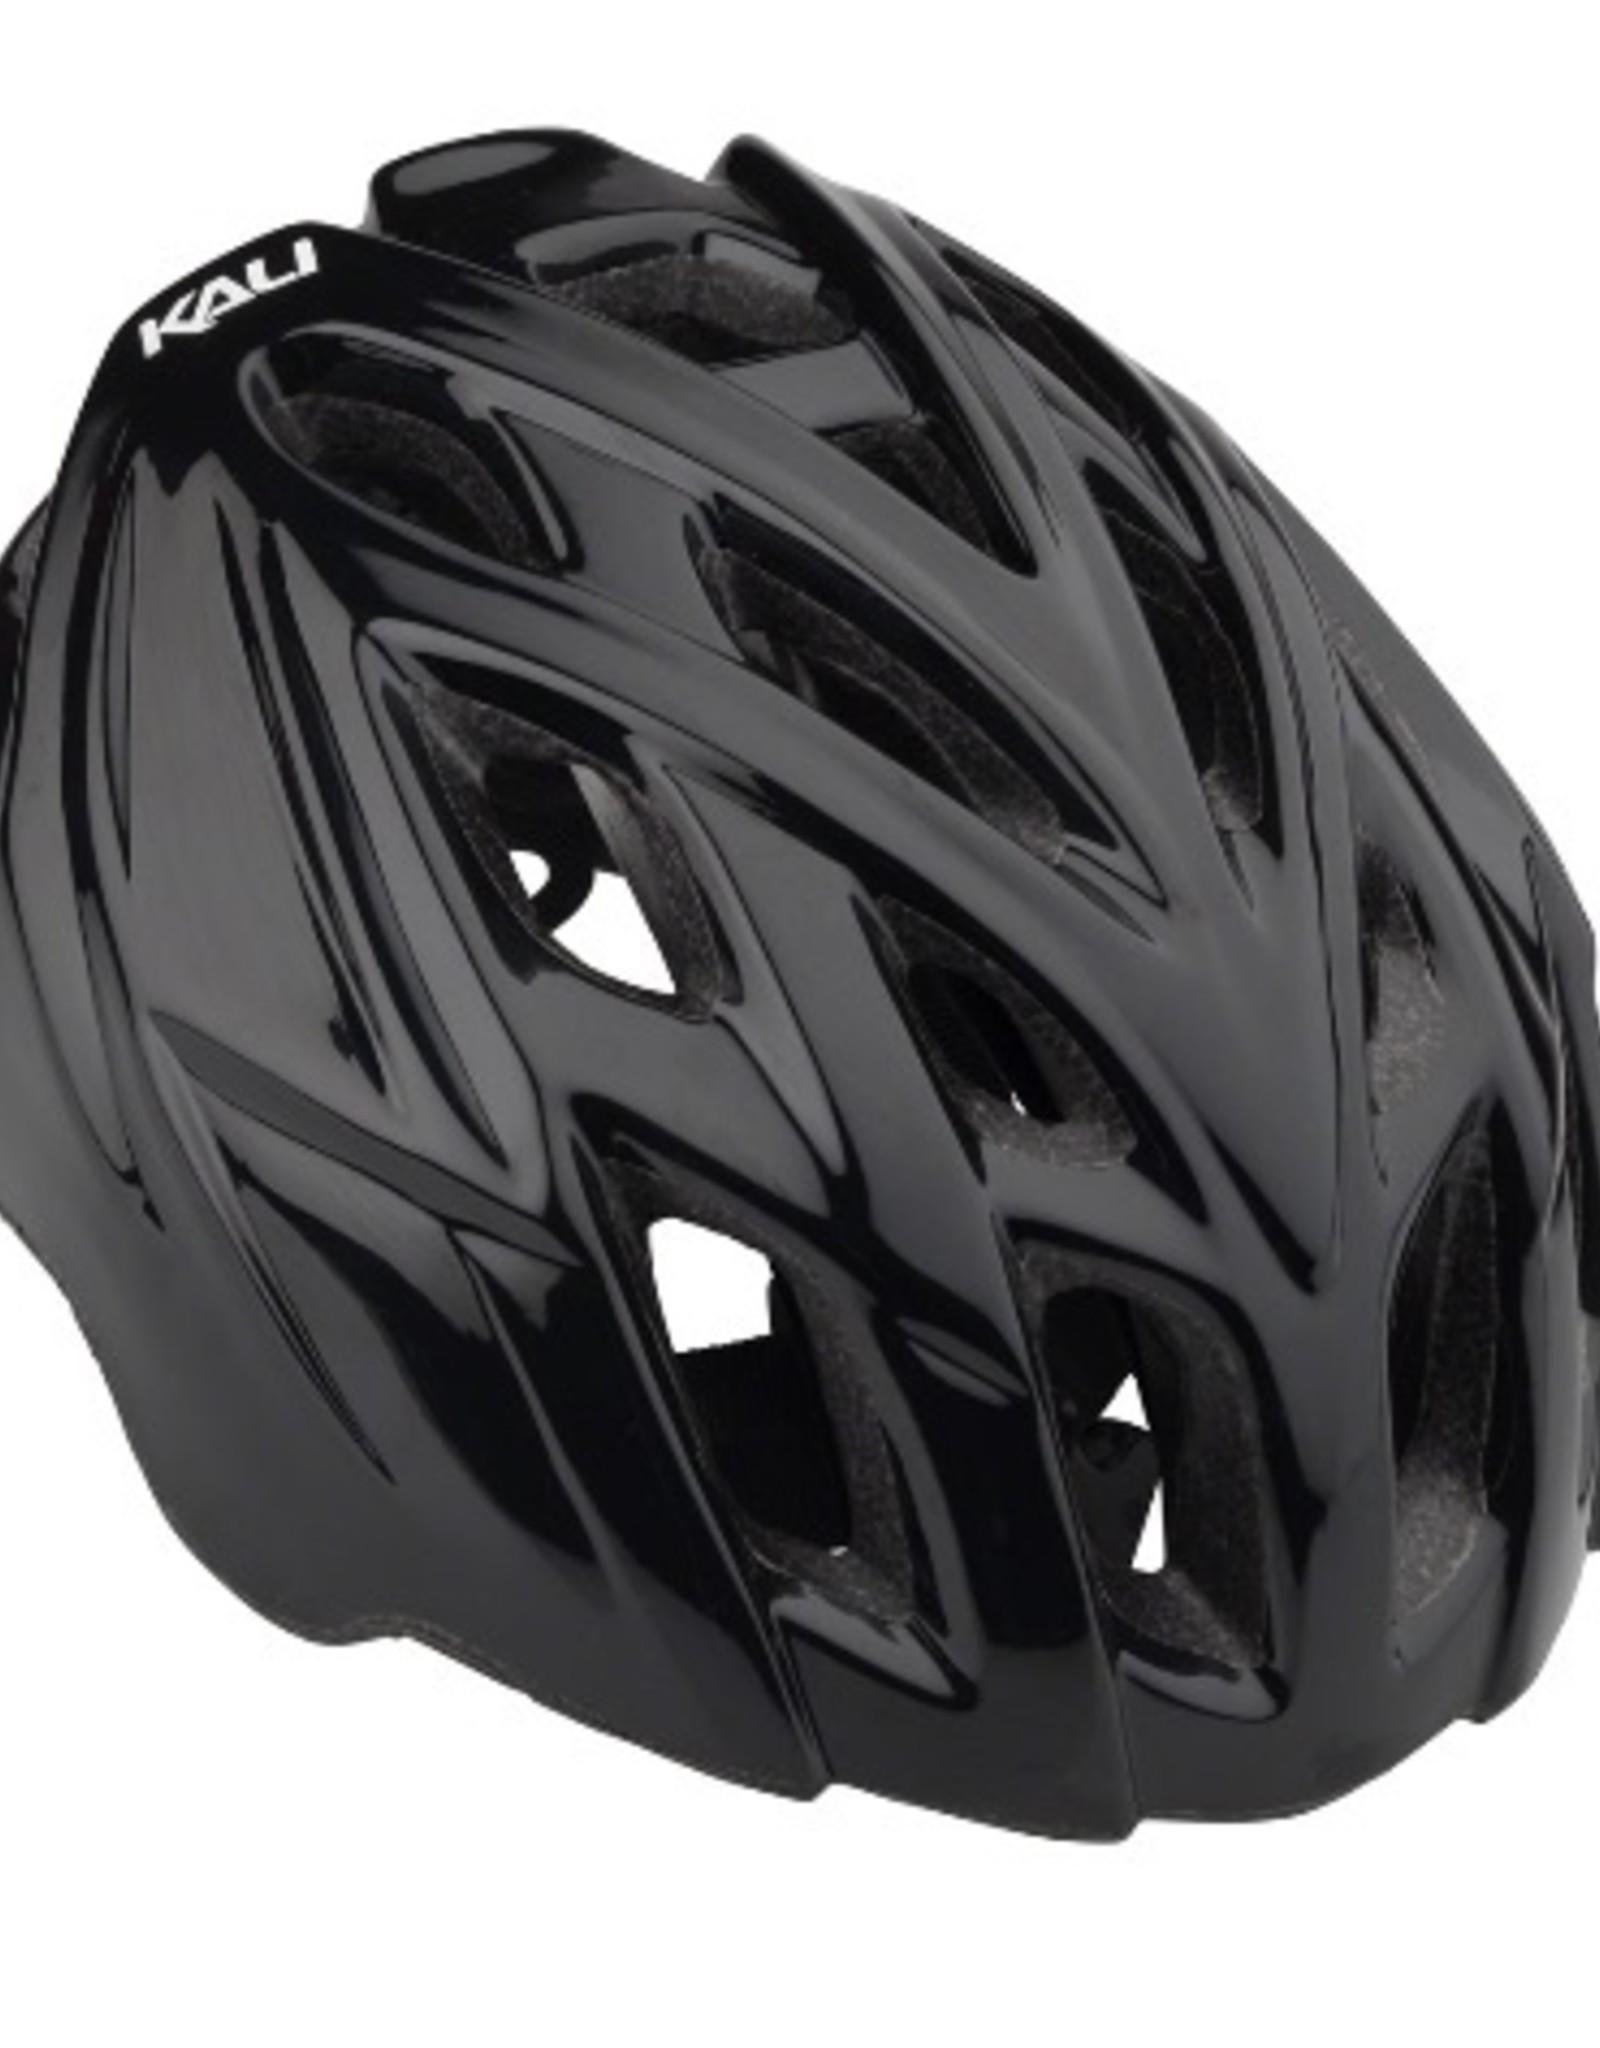 Kali Protectives Kali Chakra Helmet Black Small/Medium